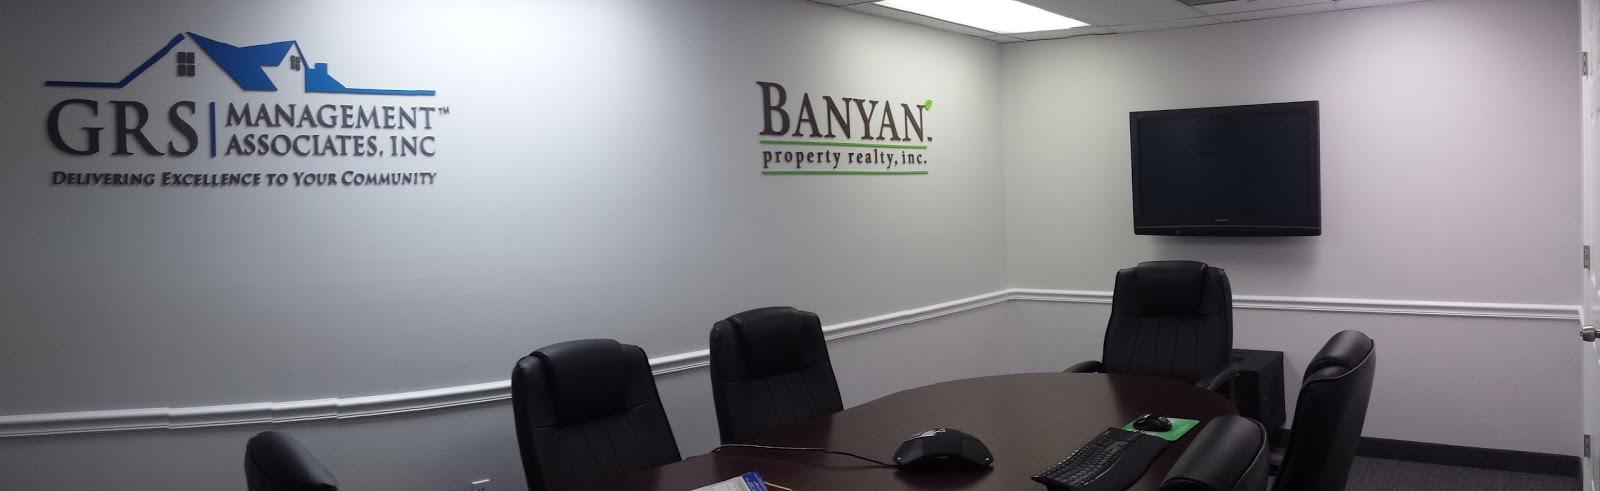 Banyan Property Management West Palm Beach Fl